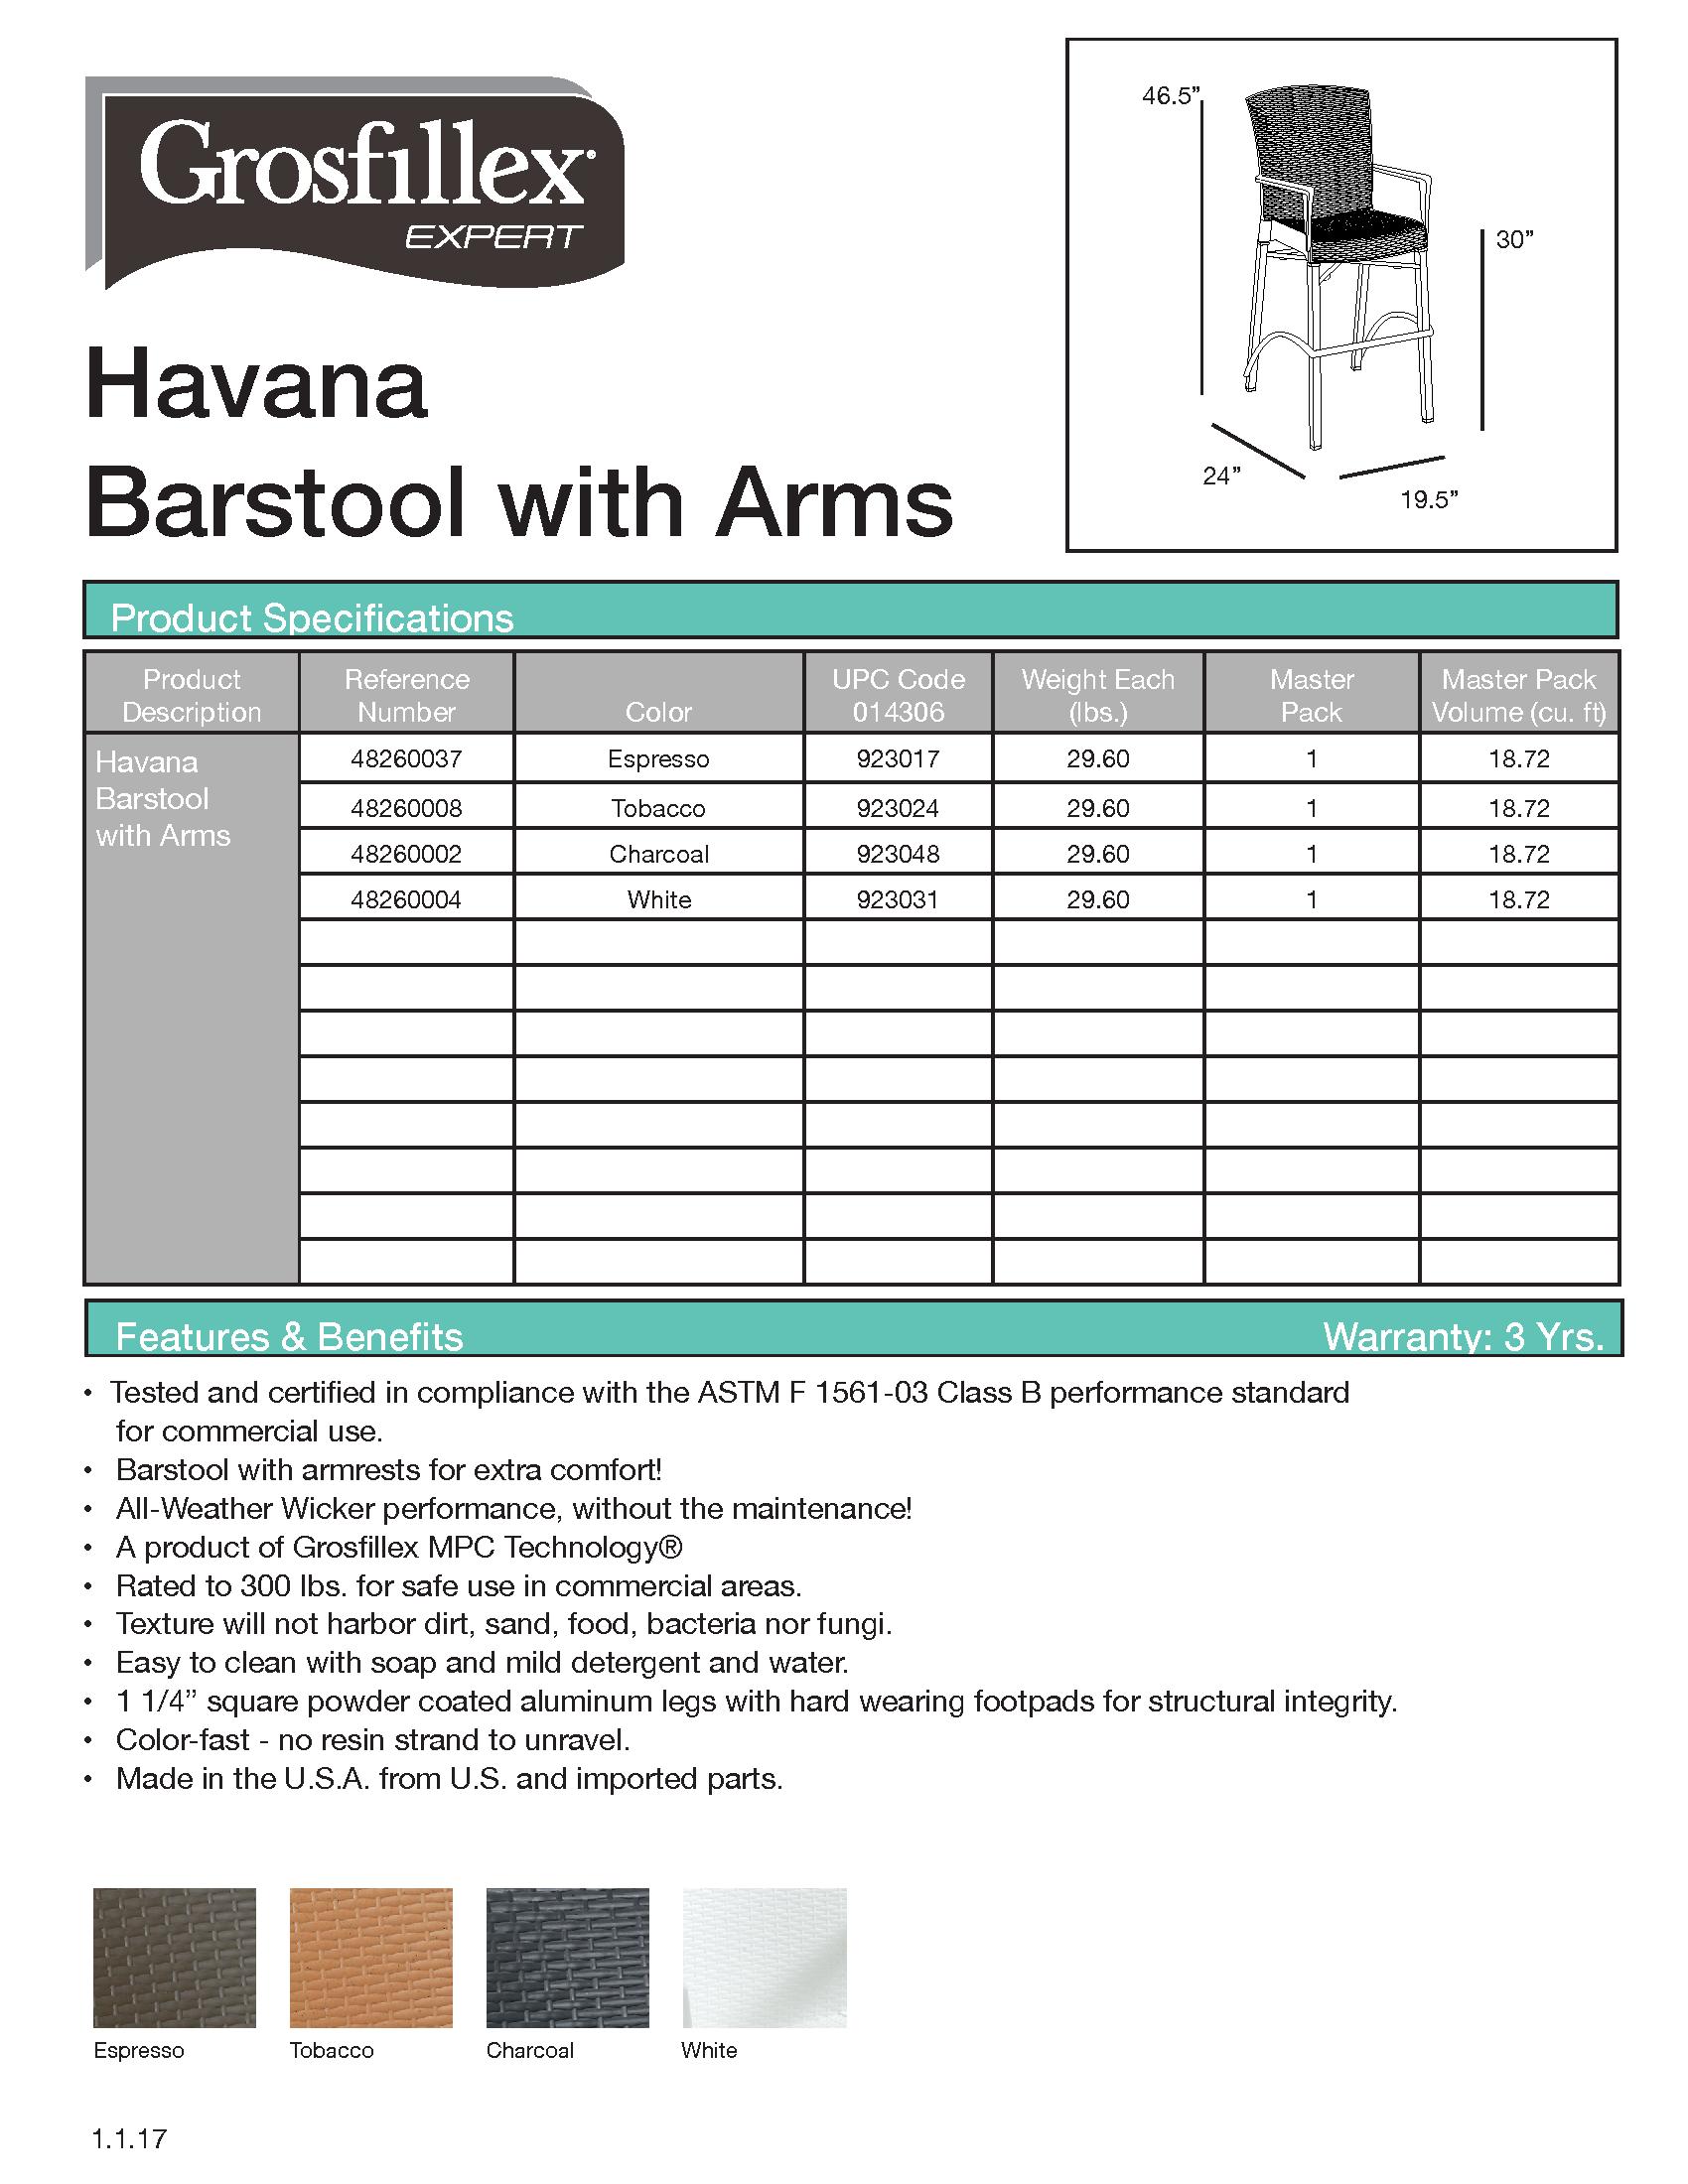 Havana Barstool